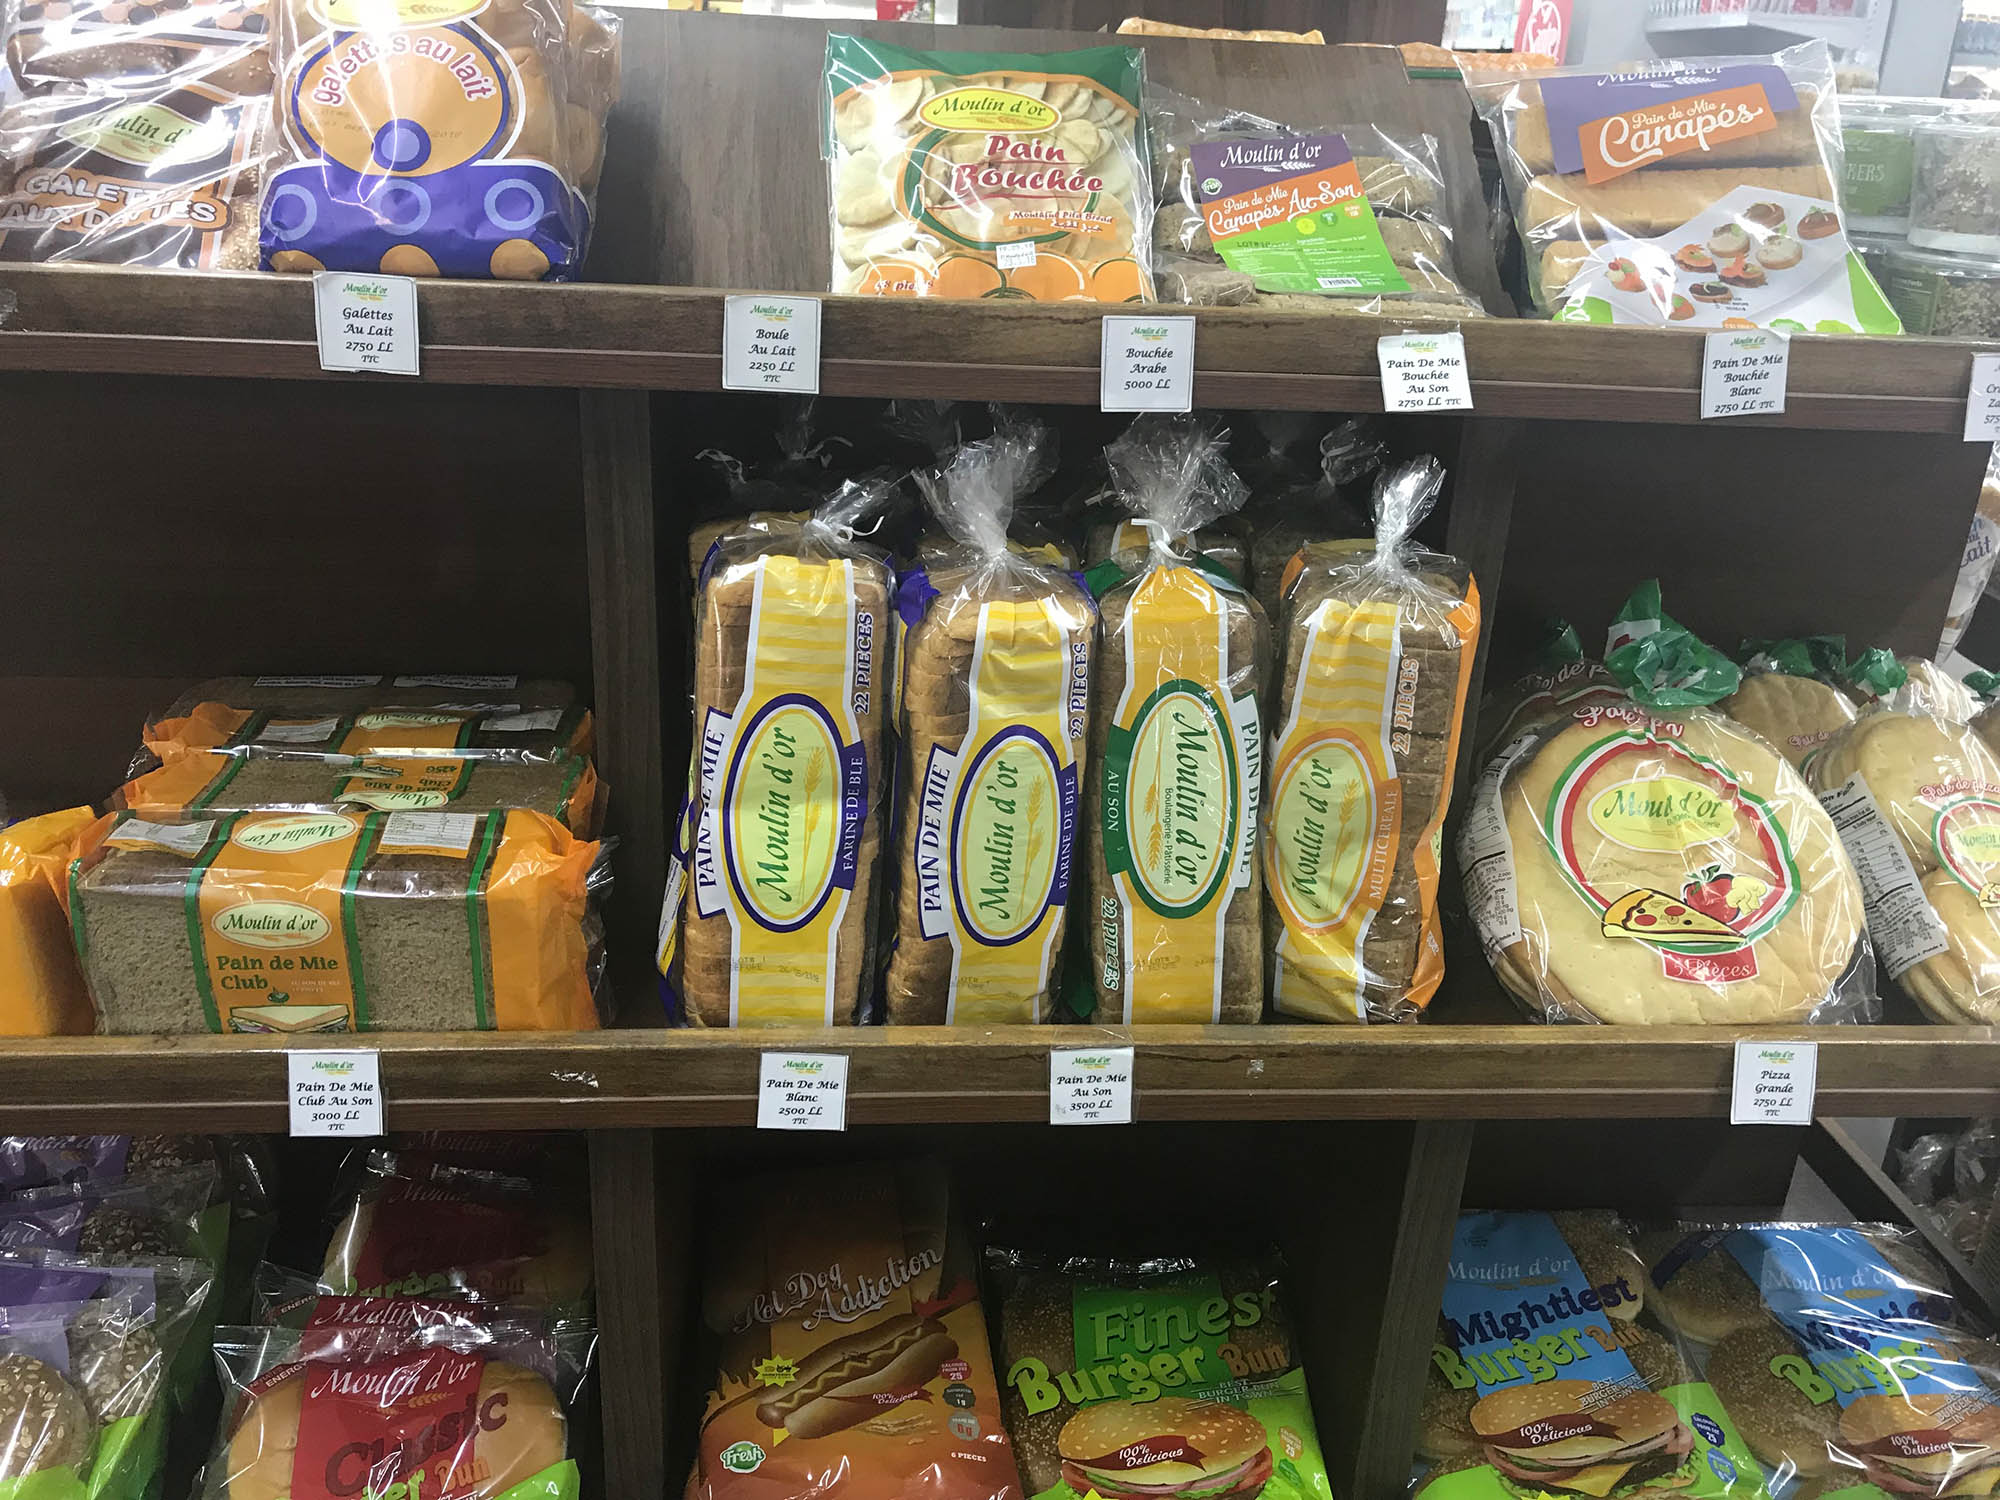 Французский нарезной батон в супермаркете — 1,6$ (99 р.)